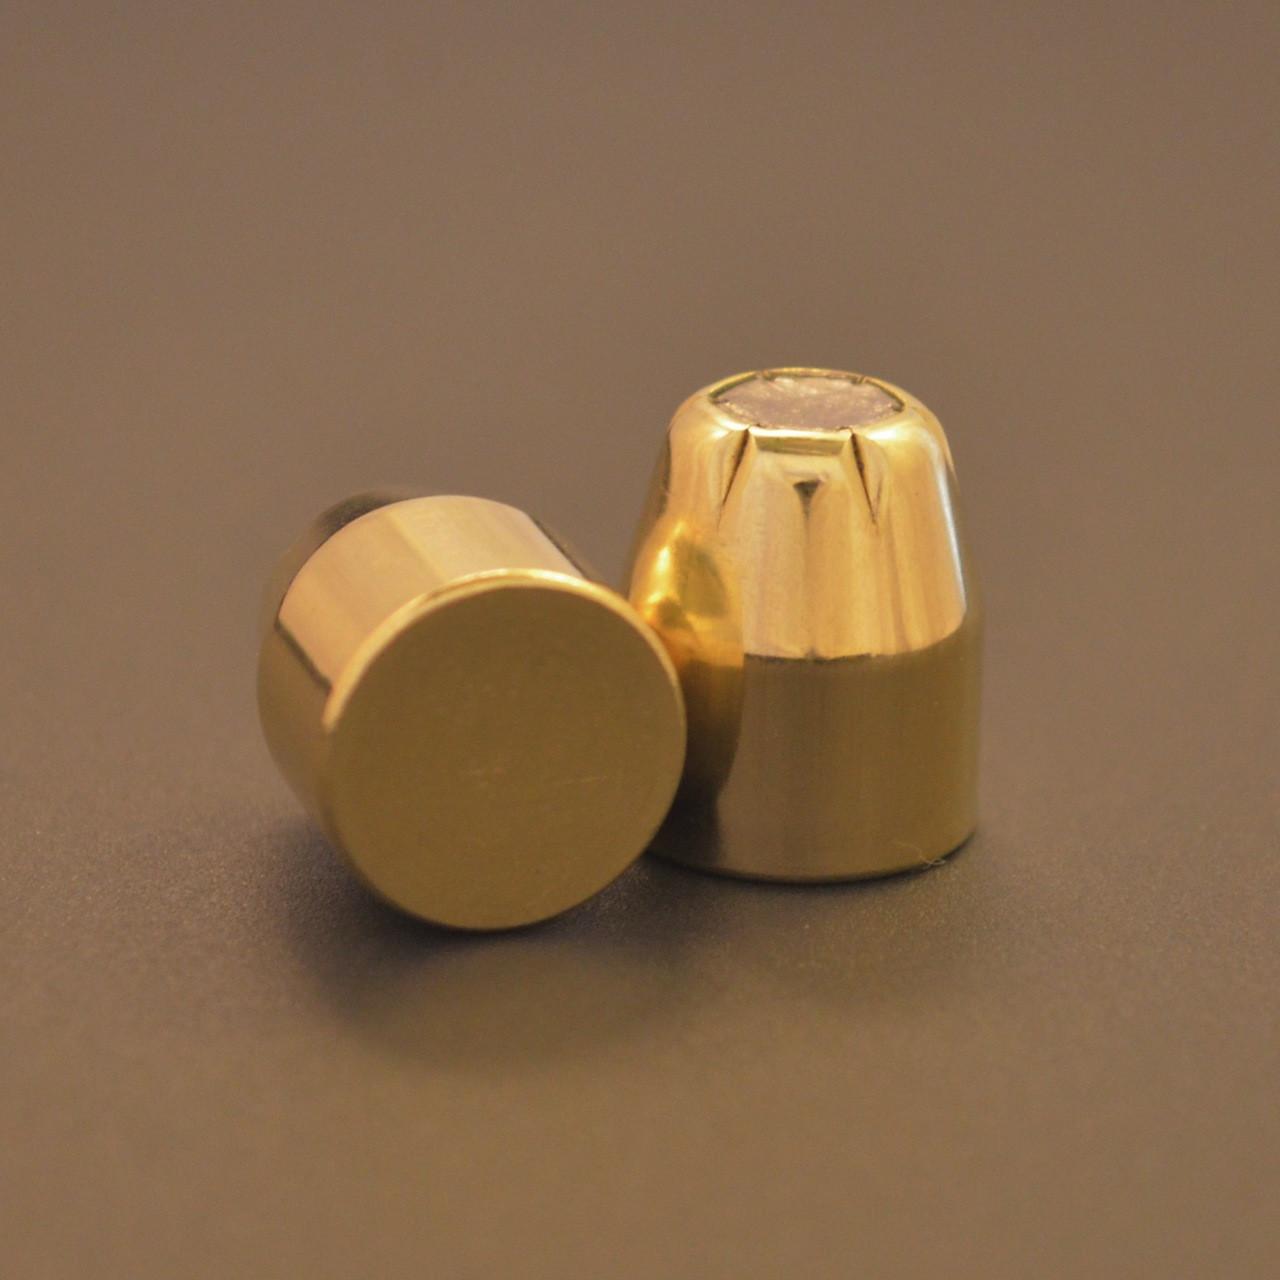 .45/185gr JHP - 100ct